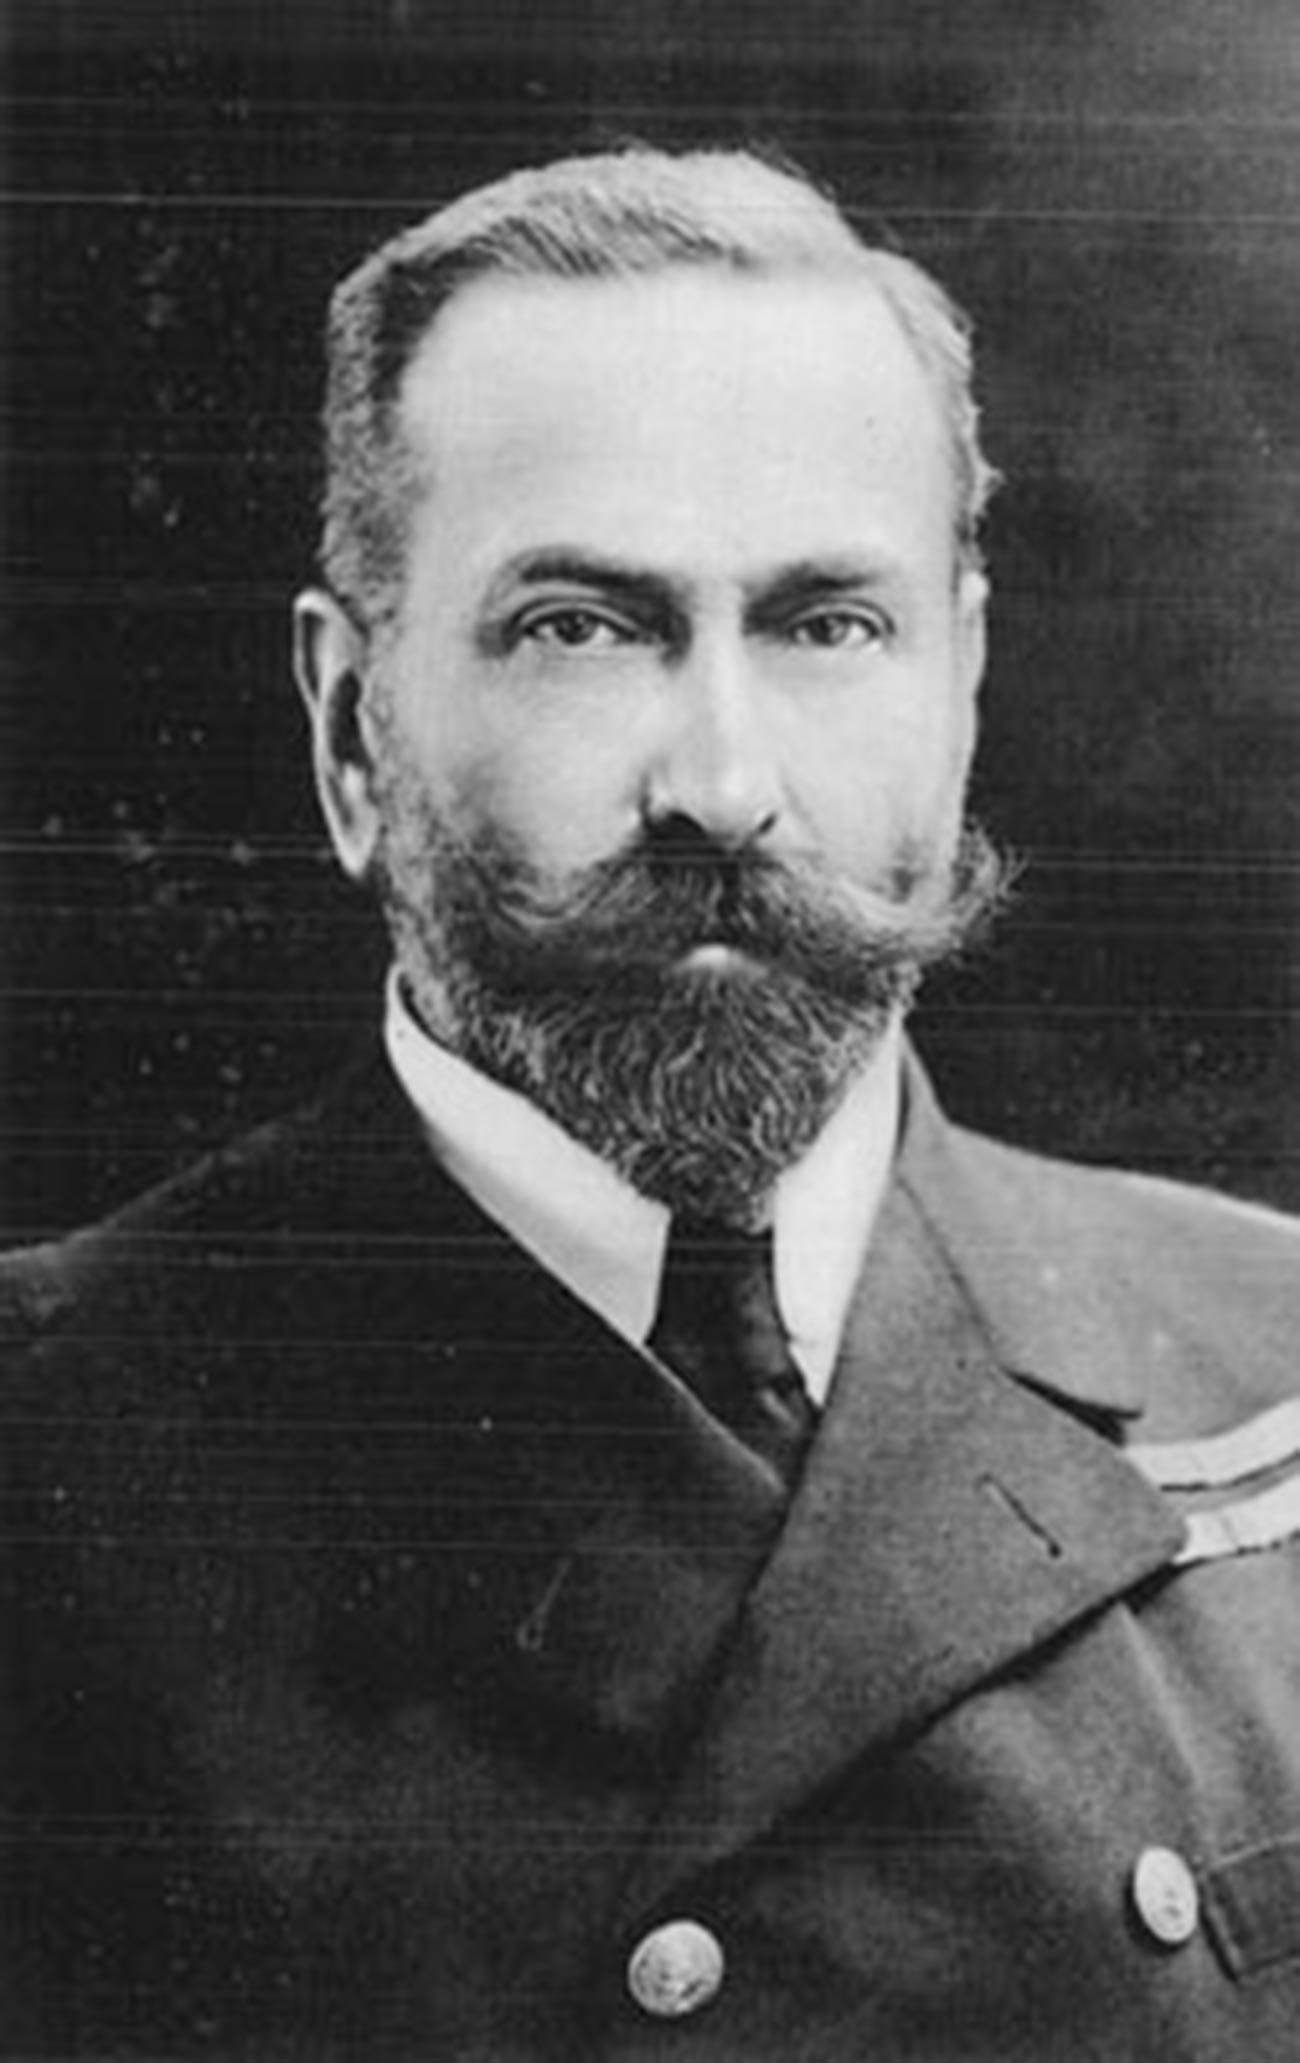 Príncipe Luís Aleksandr de Battenberg (Louis Alexander Mountbatten), 1854-1921